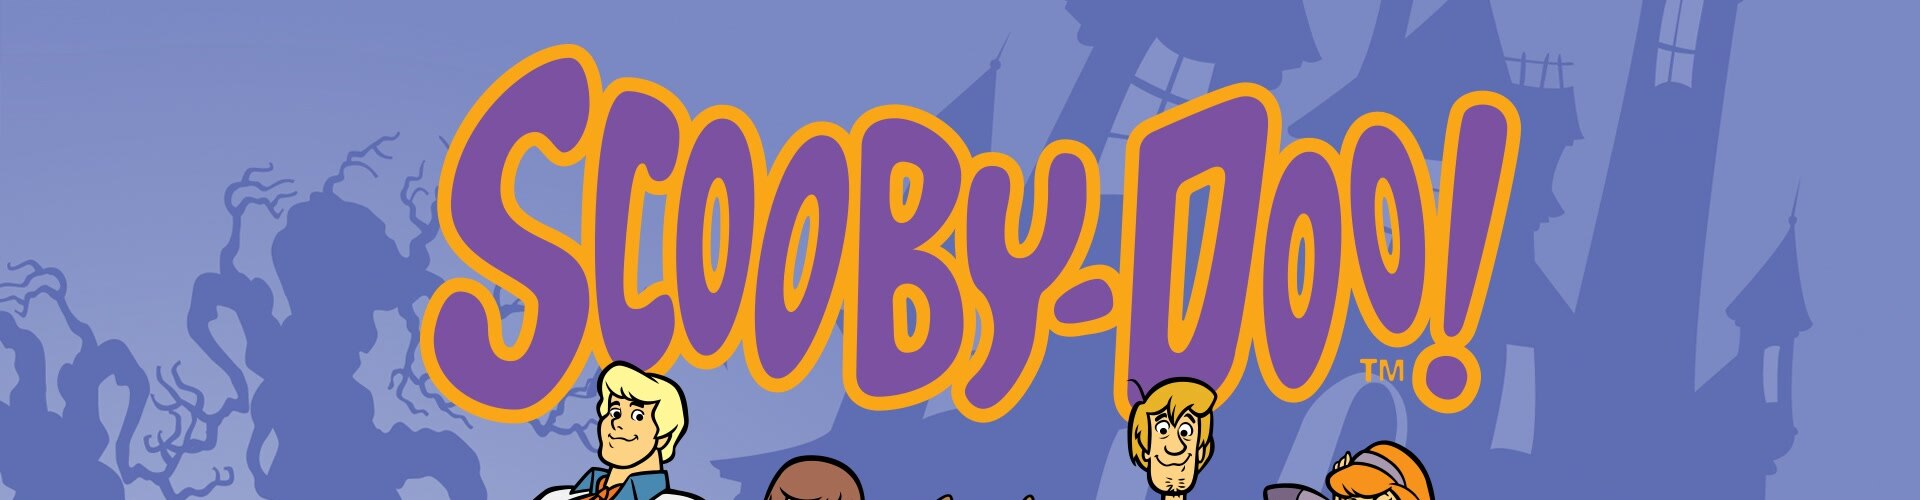 Watch The Scooby Doo Show Online